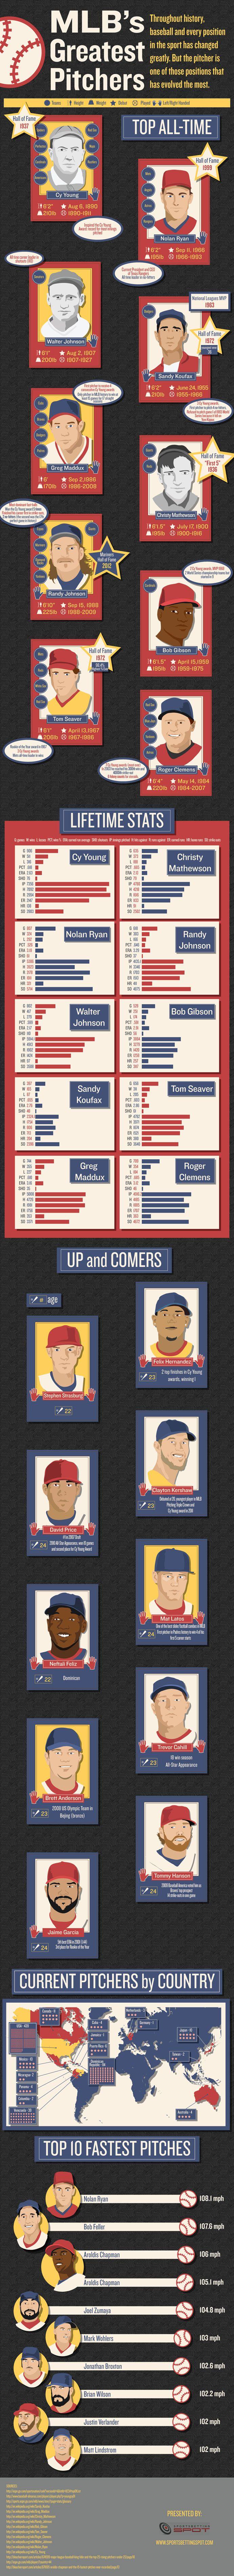 65 best baseball images on pinterest info graphics infographic